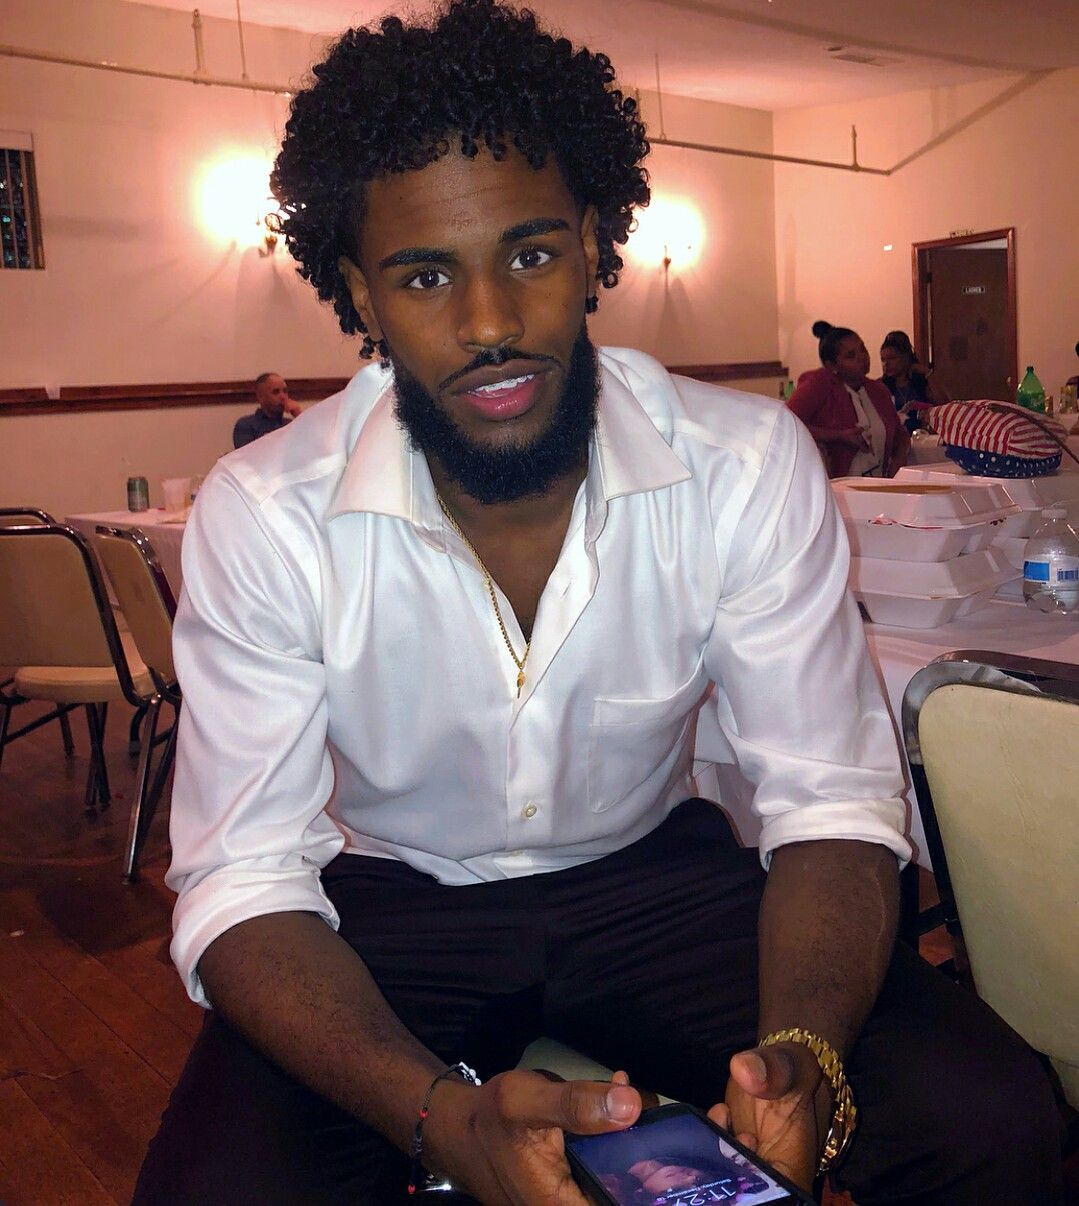 Pinterest Desszyb For Lit Pins Dark Skin Men Boys With Curly Hair Man Bun Hairstyles